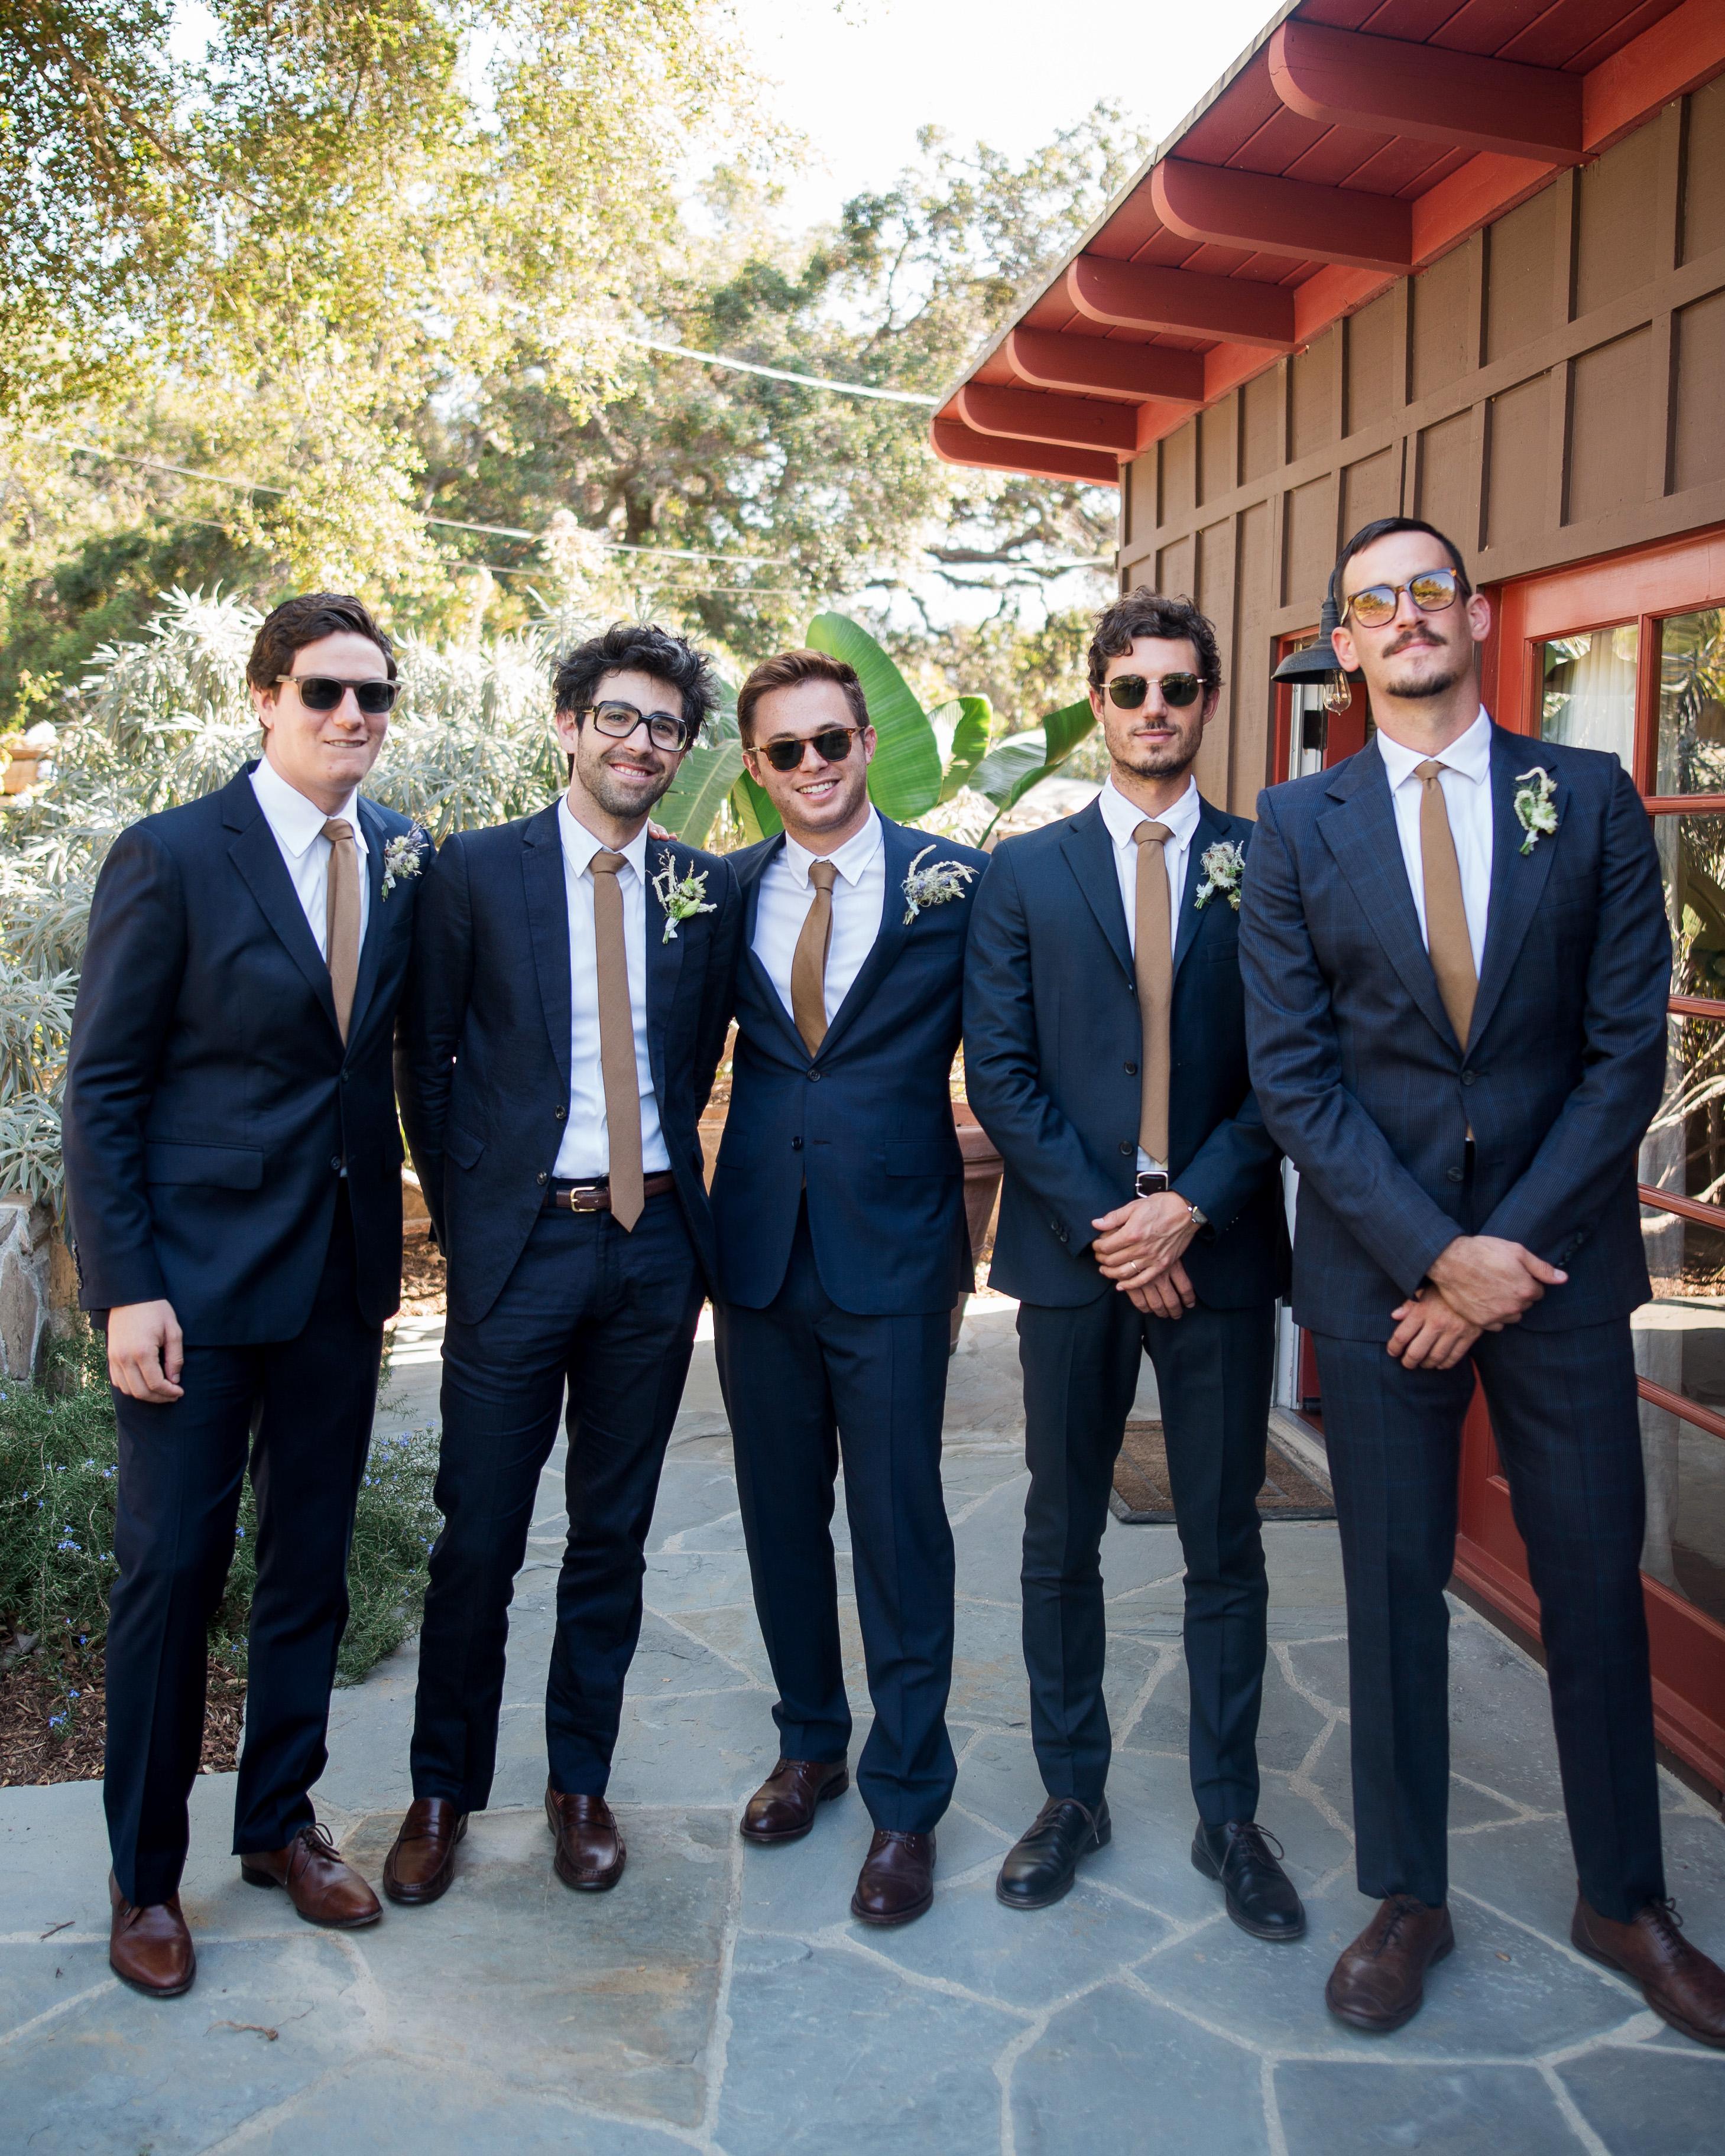 anika max wedding groomsmen wearing sunglasses